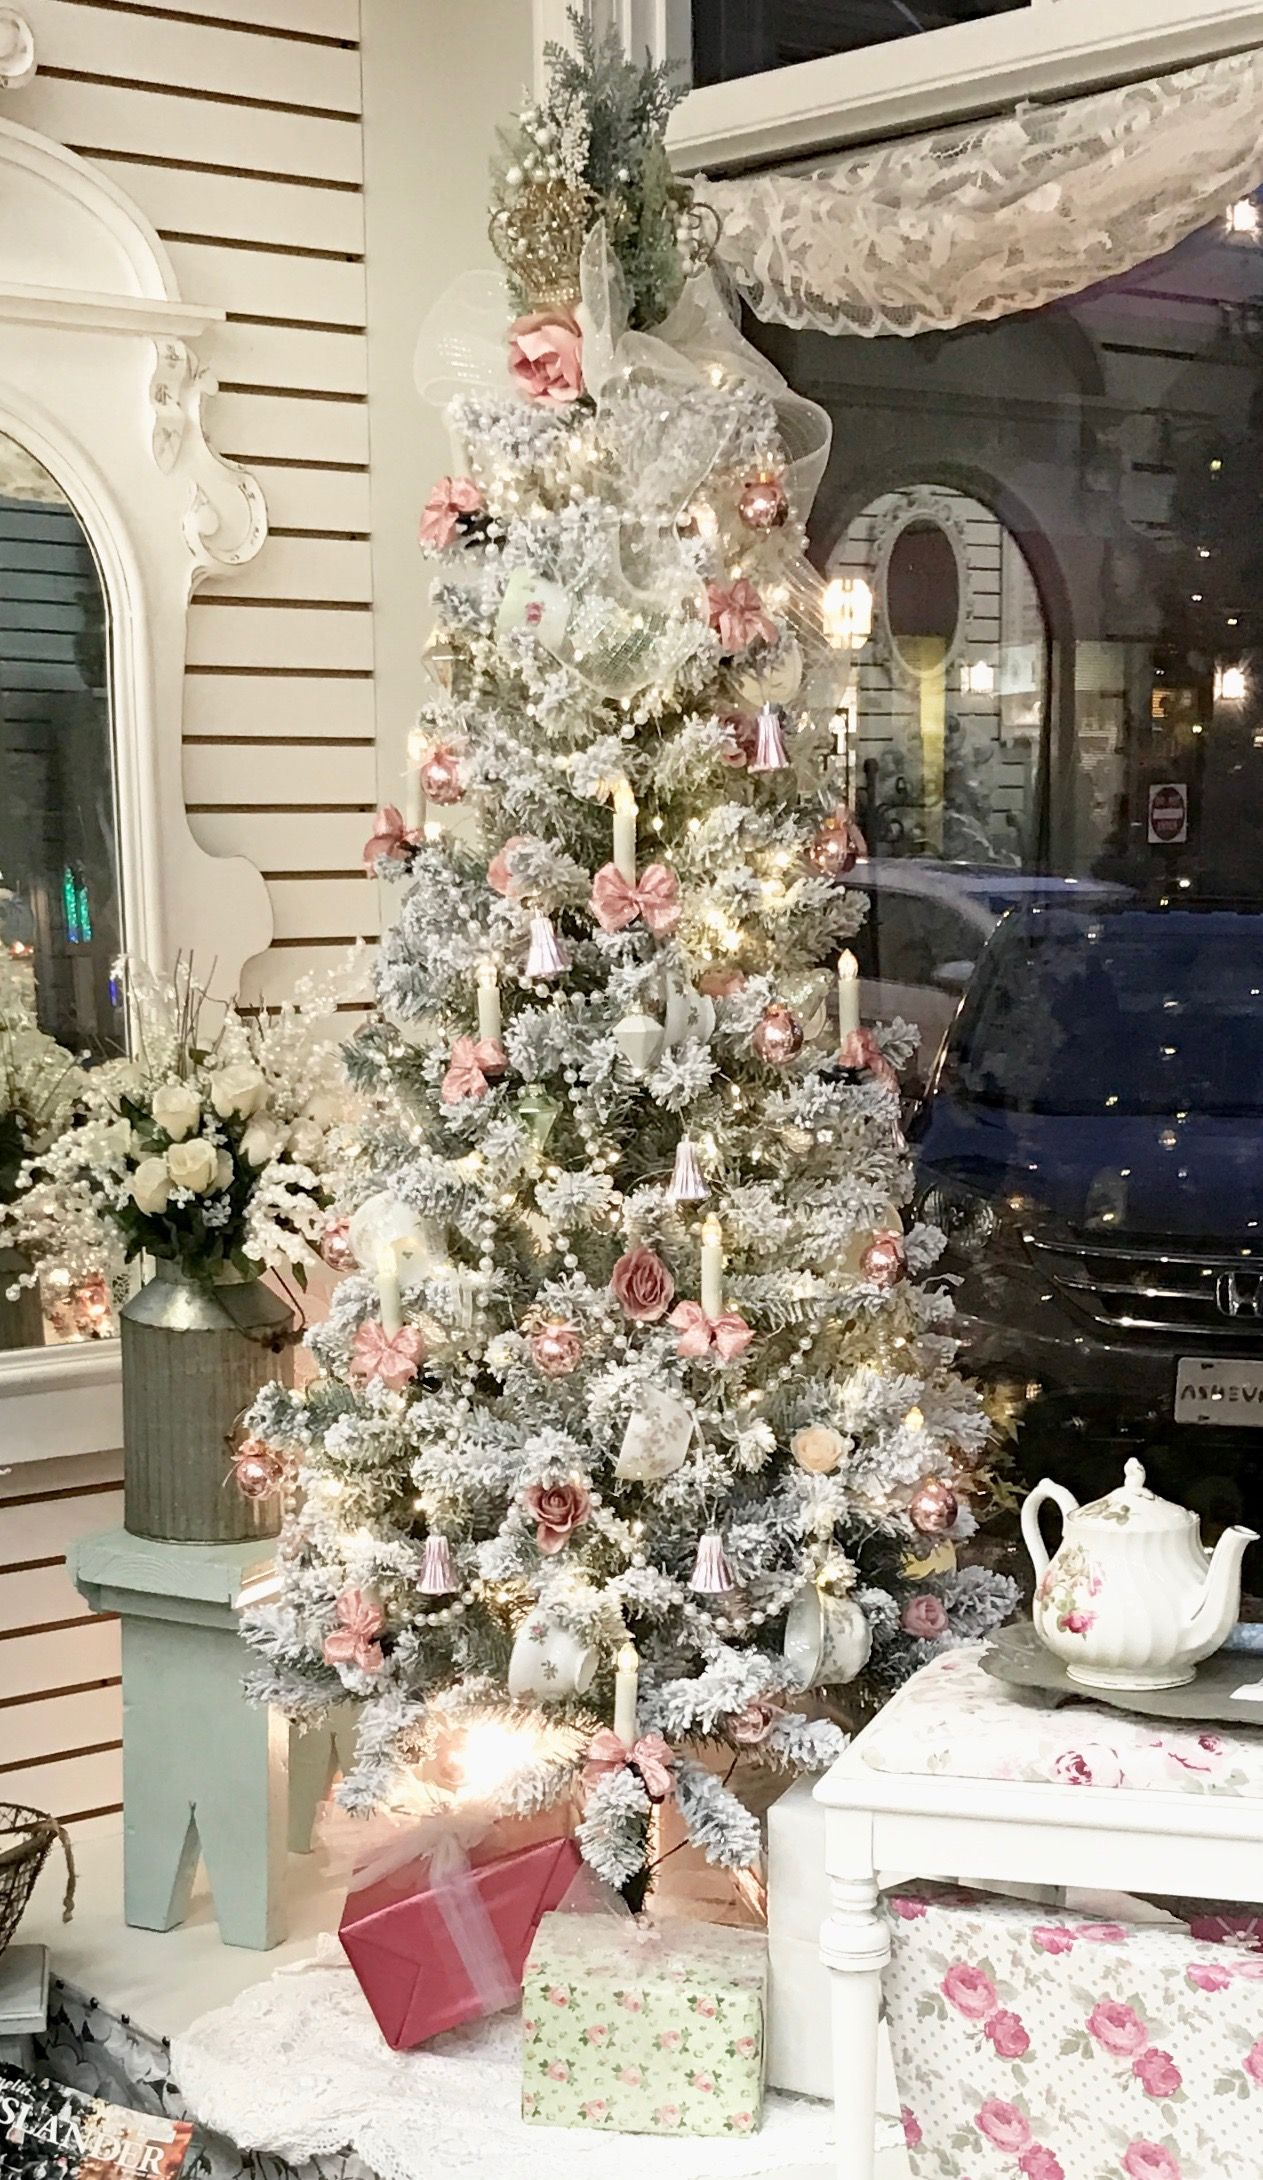 Shabby Chic Christmas Tree Display Shabby Chic Christmas Tree Pink Christmas Tree Shabby Chic Christmas Decorations